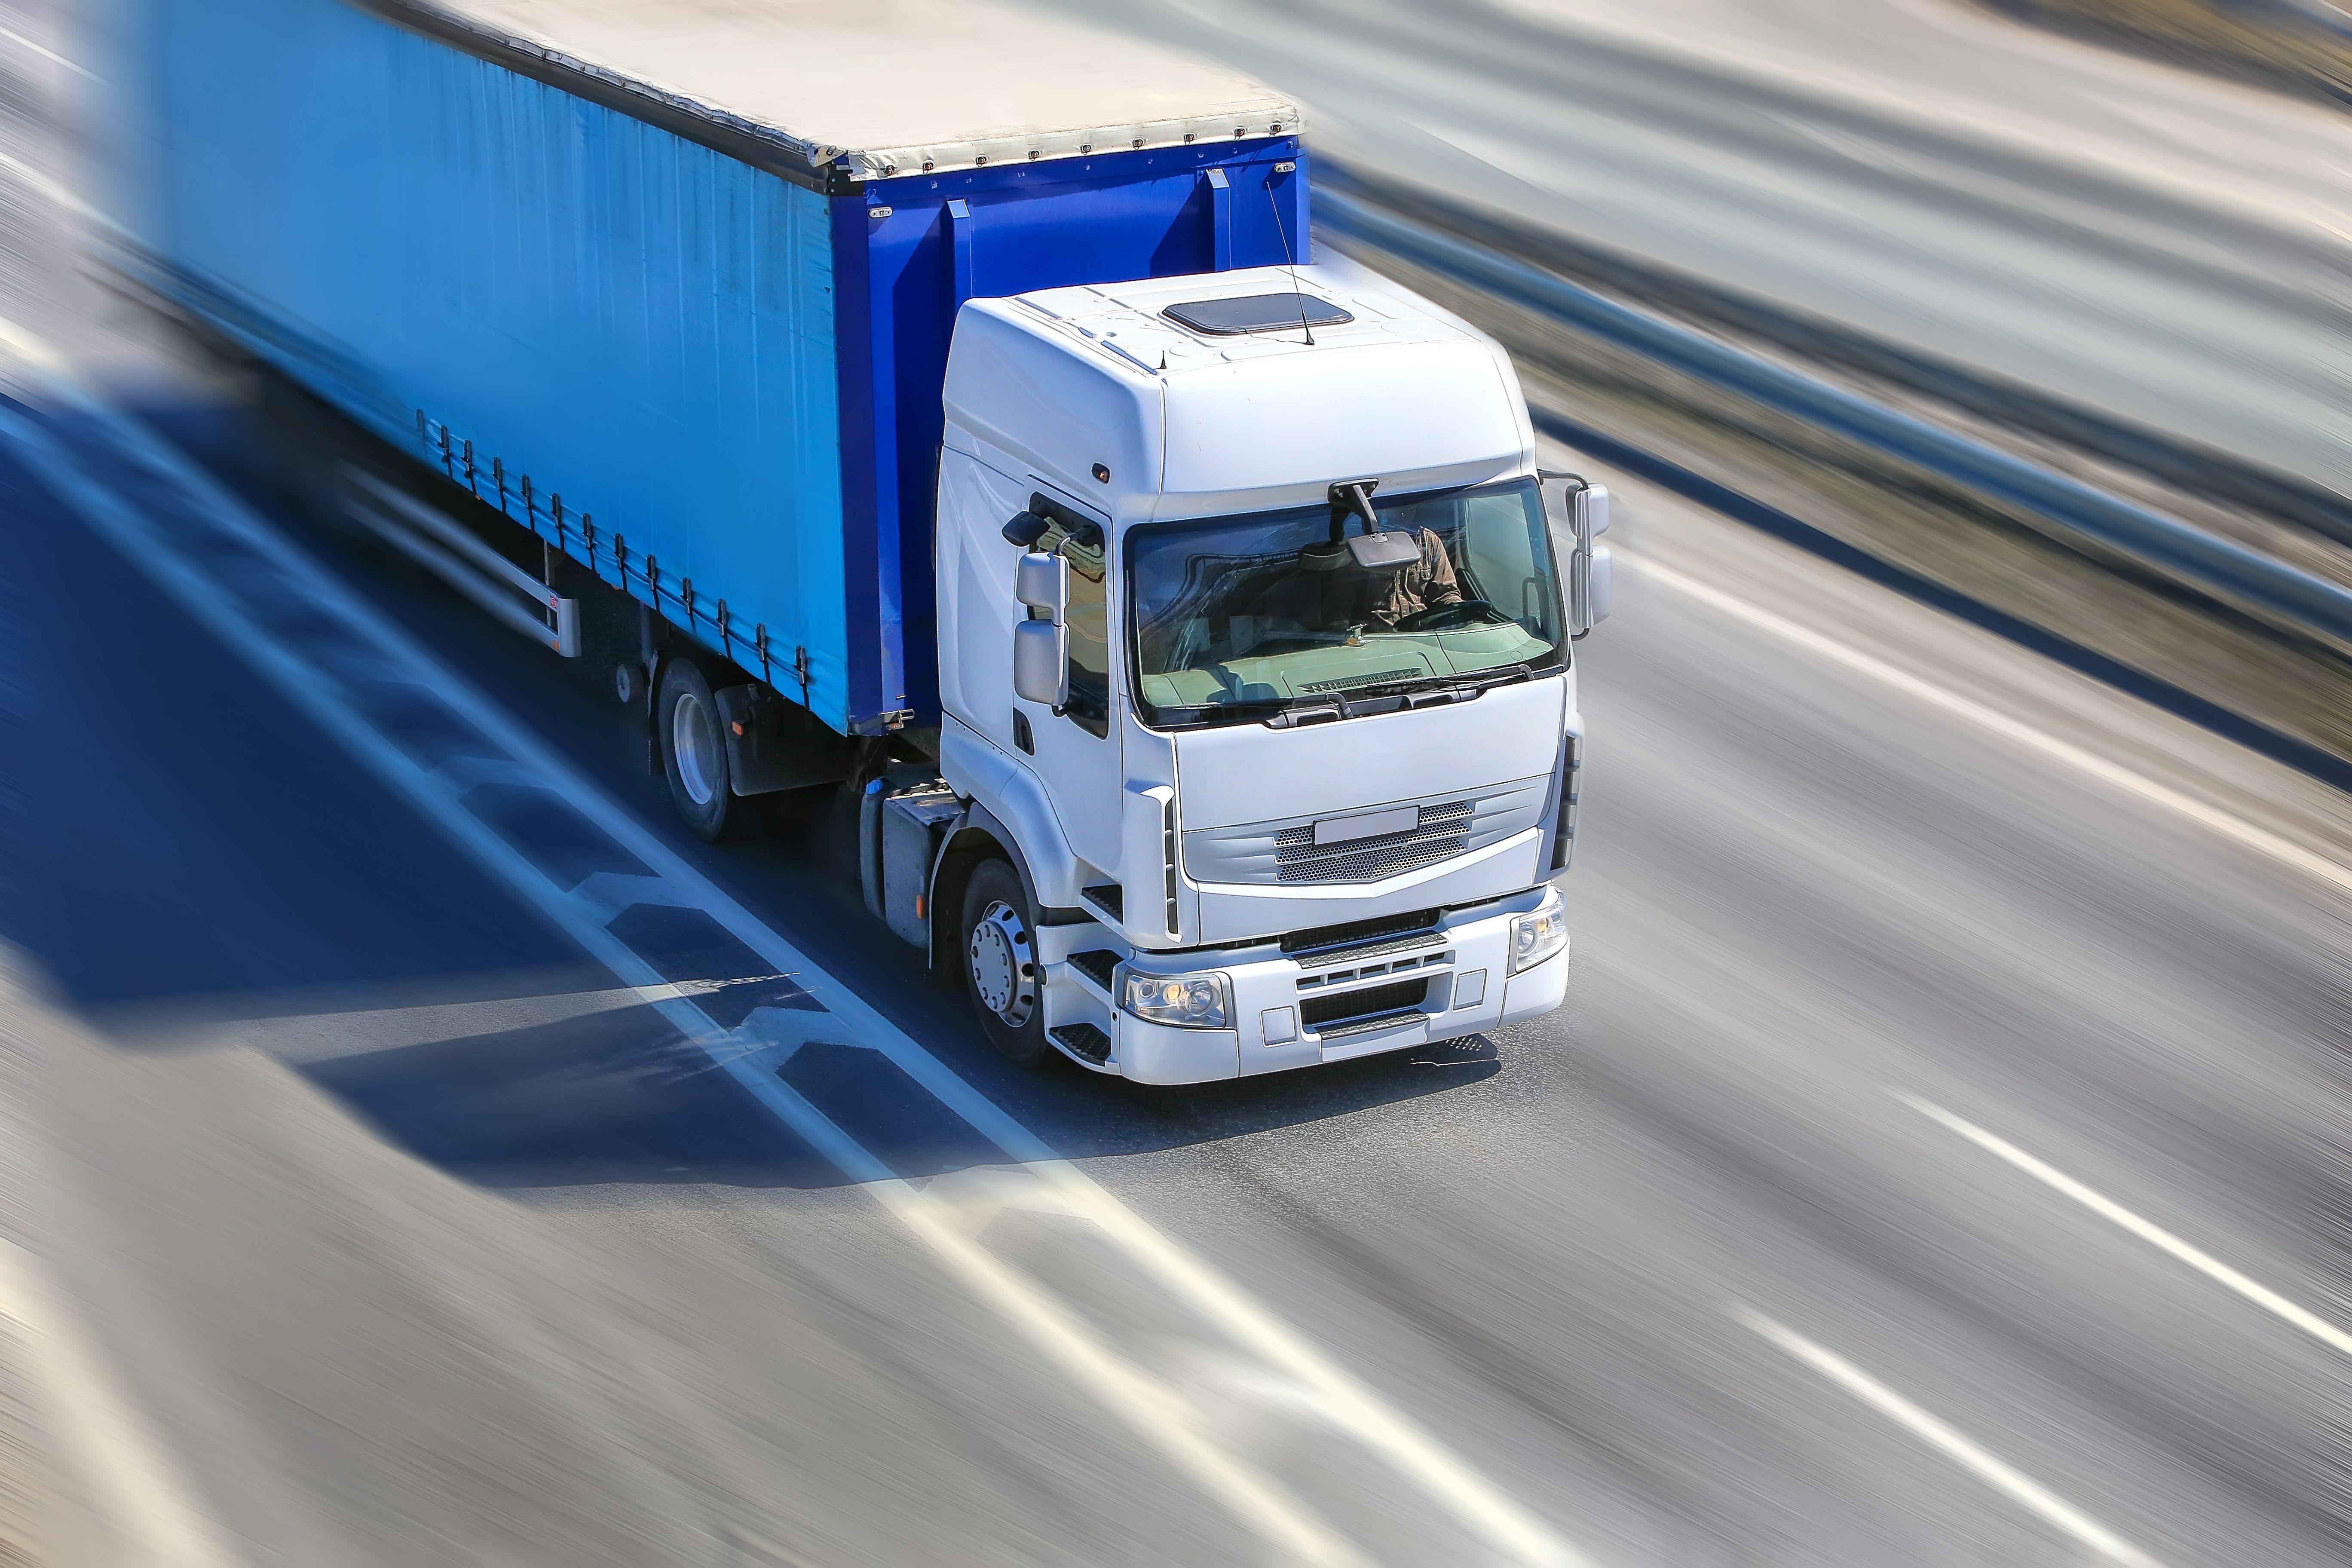 Transporte de residuos: Productos de Urkiondo Ekolur